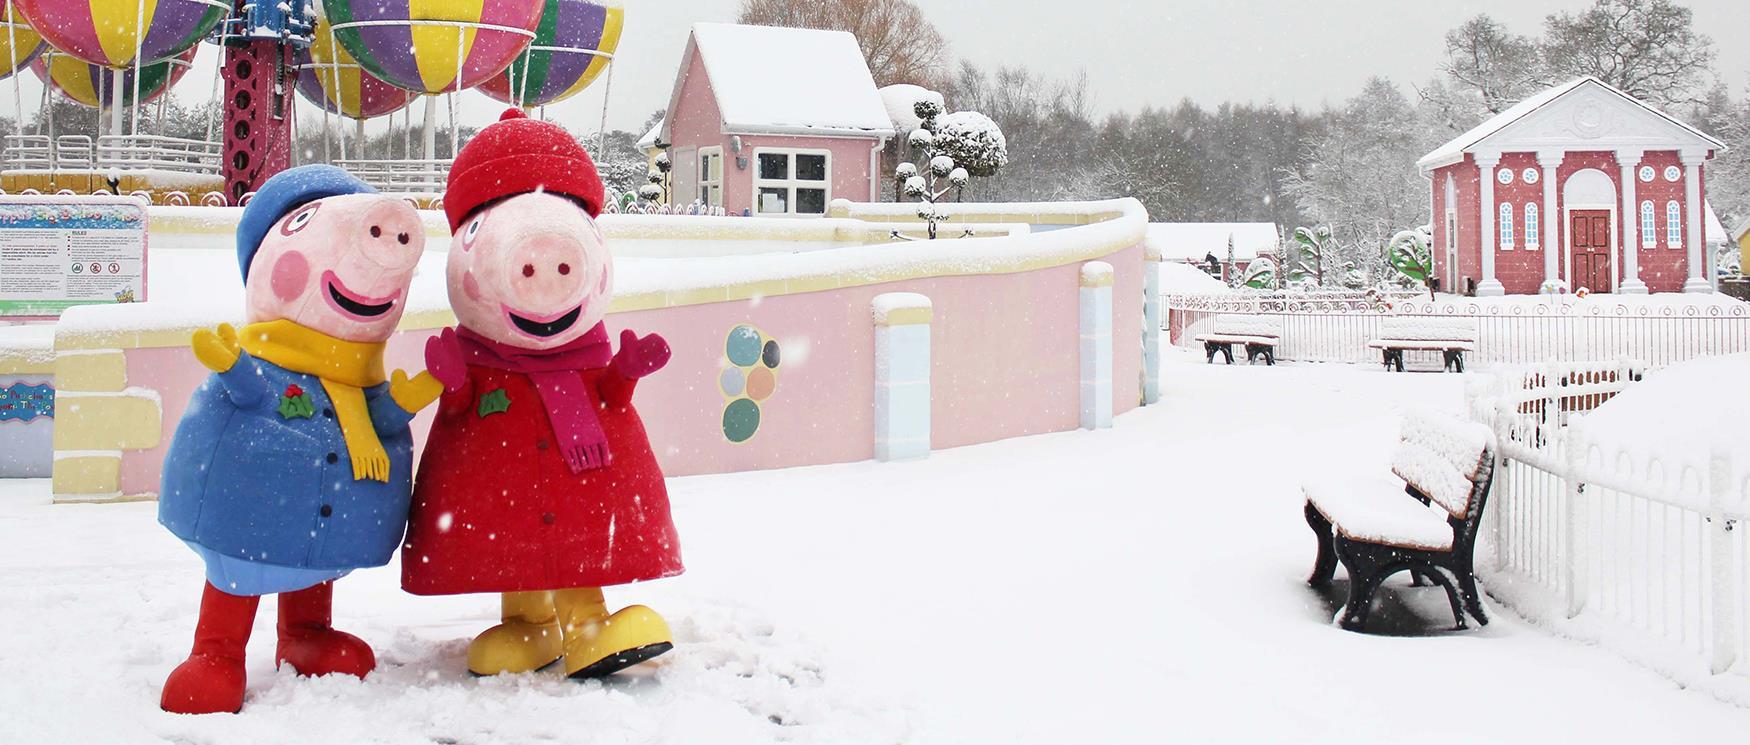 Christmas at Peppa Pig World in Paultons Park